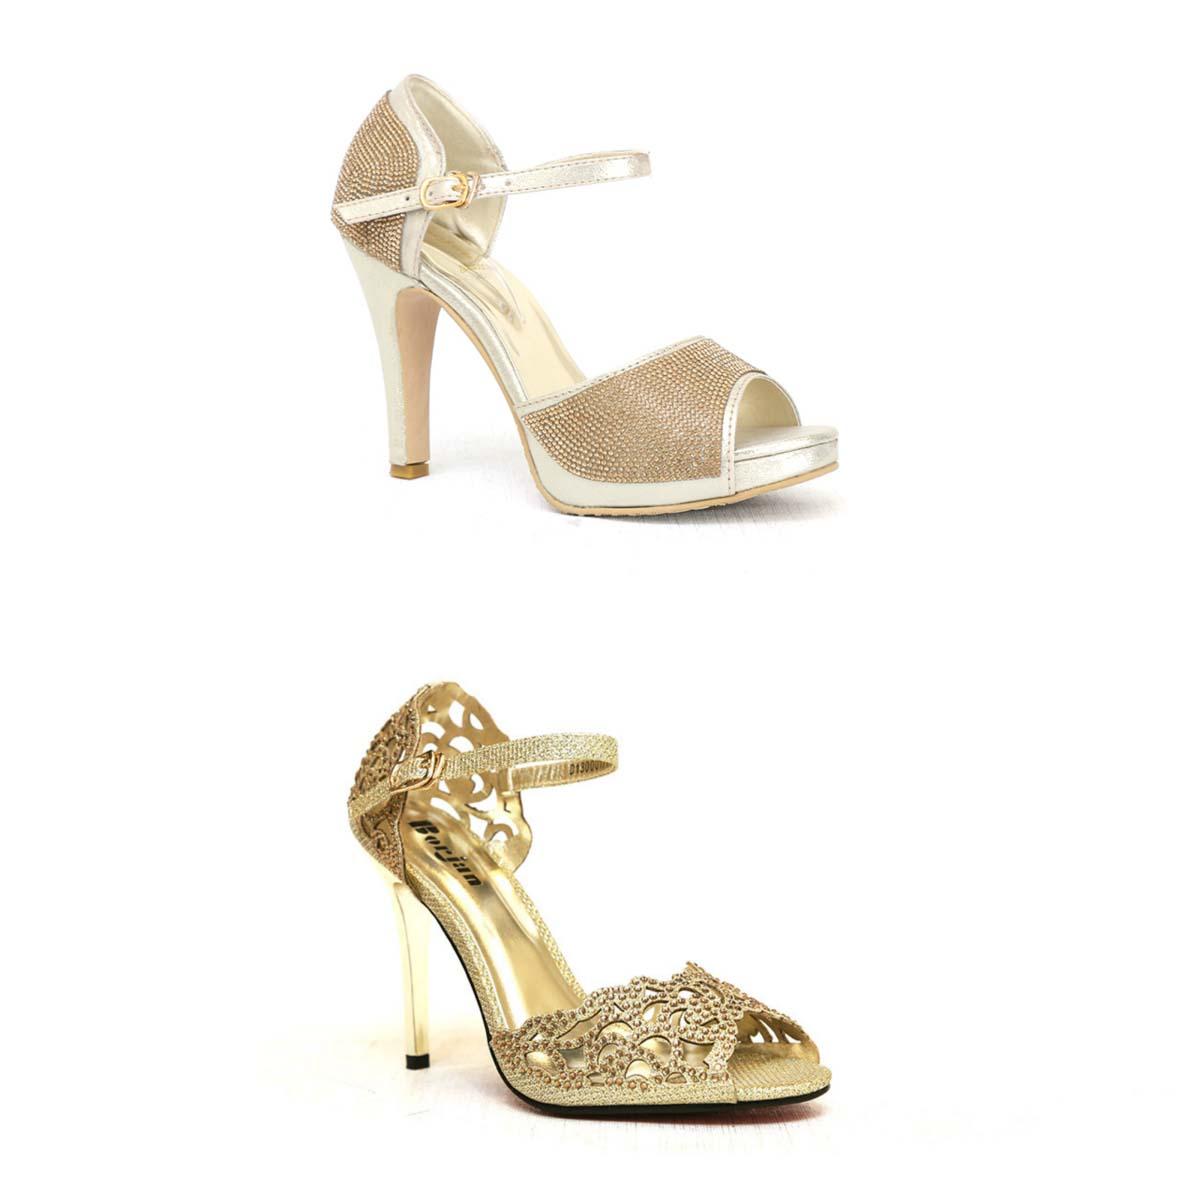 borjan-fancy-bridal-shoes-wedding-2017-2018-collection-4